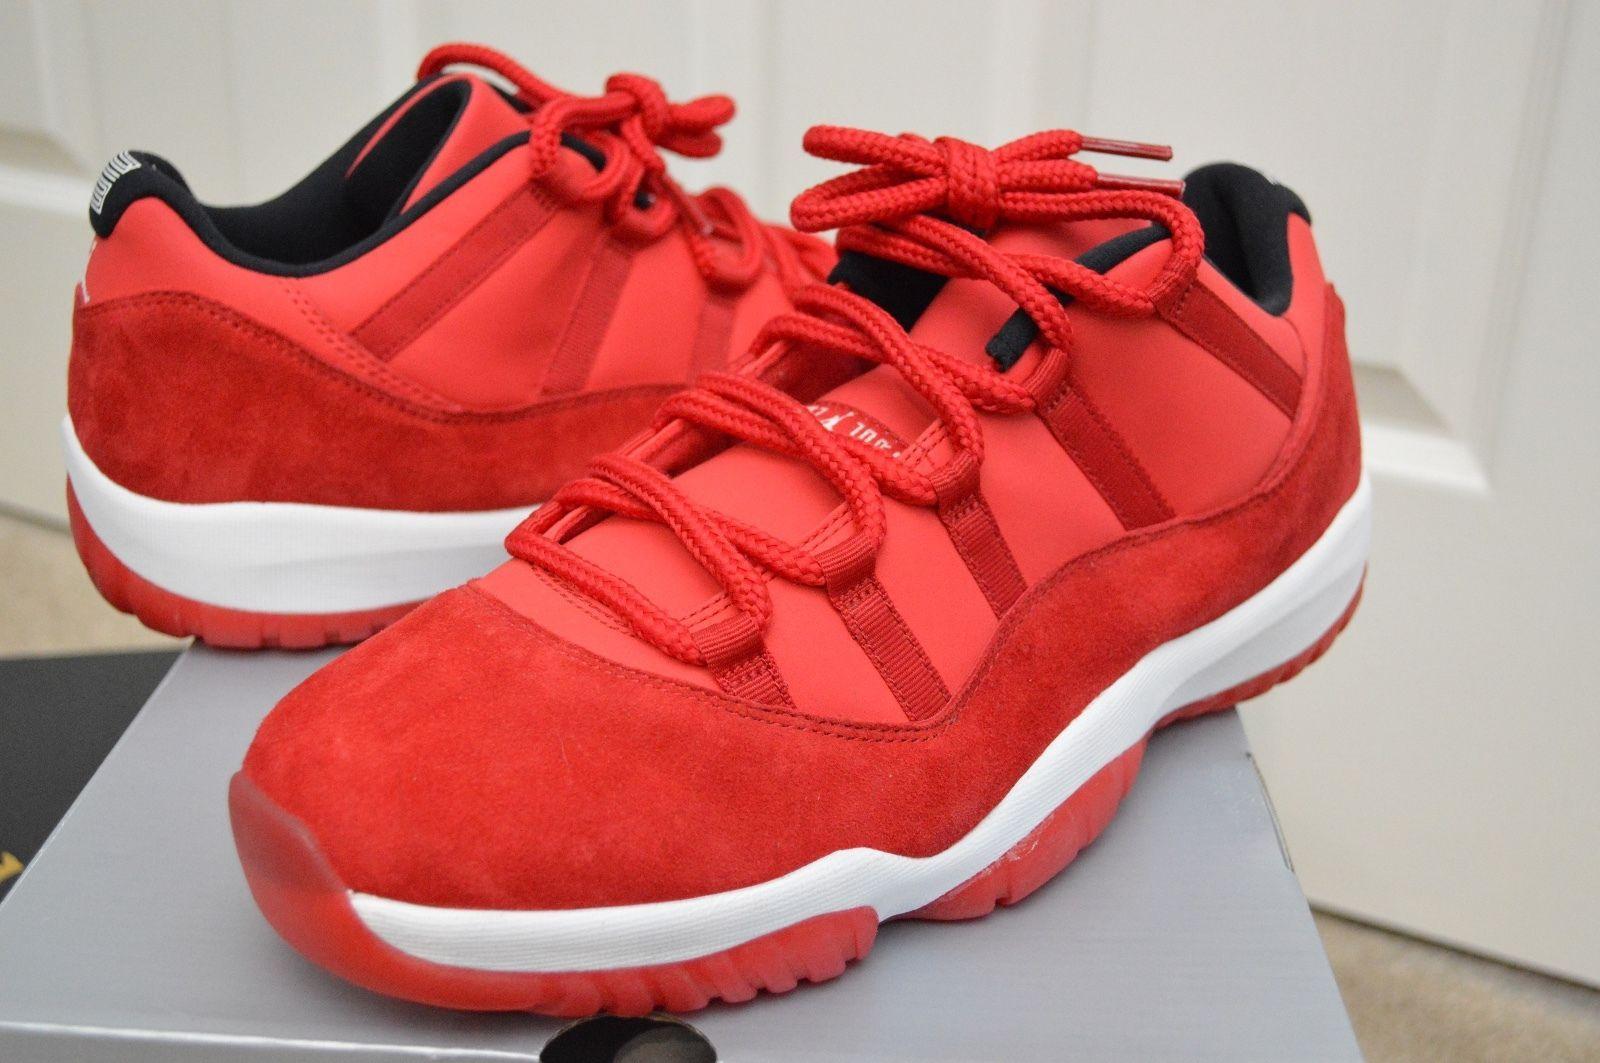 f2a609cf3d0 New DS Nike Air Jordan 11 (XI) Retro Low Sz 12 Red Suede Rare PE ...